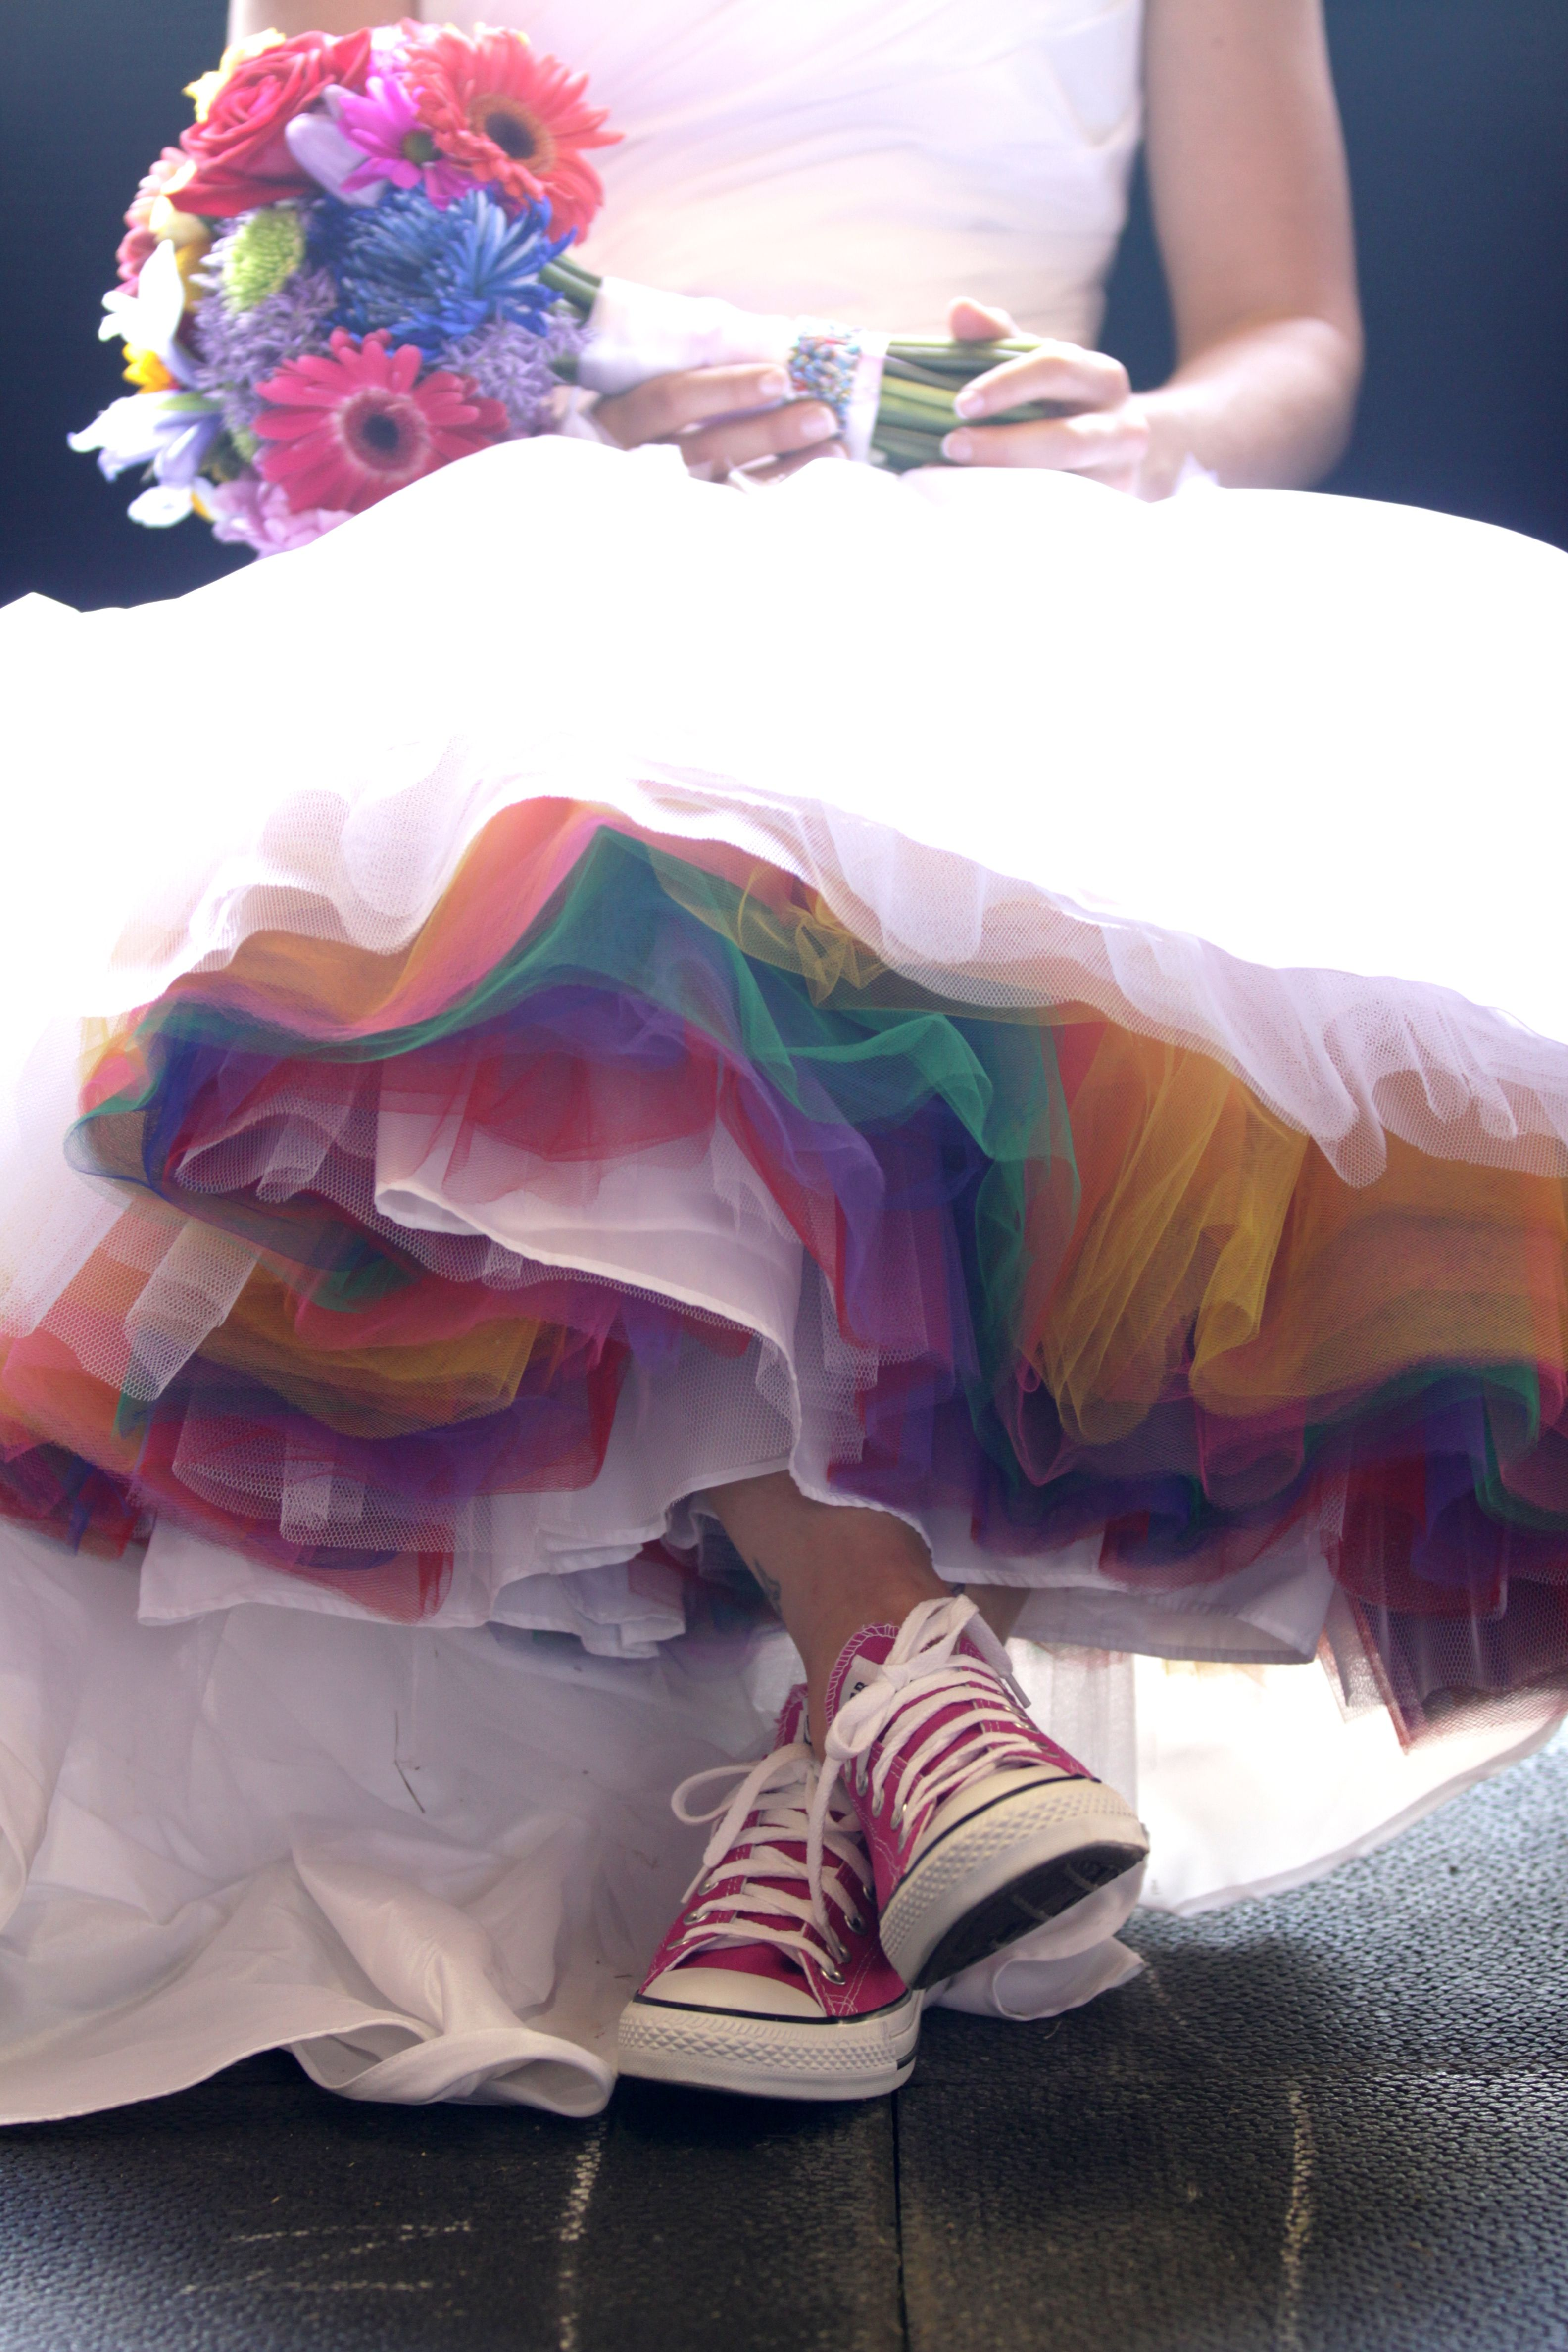 Pin By Martona On My Diy Colorful Rainbow Wedding Rainbow Wedding Dress Rainbow Wedding Colored Wedding Dresses